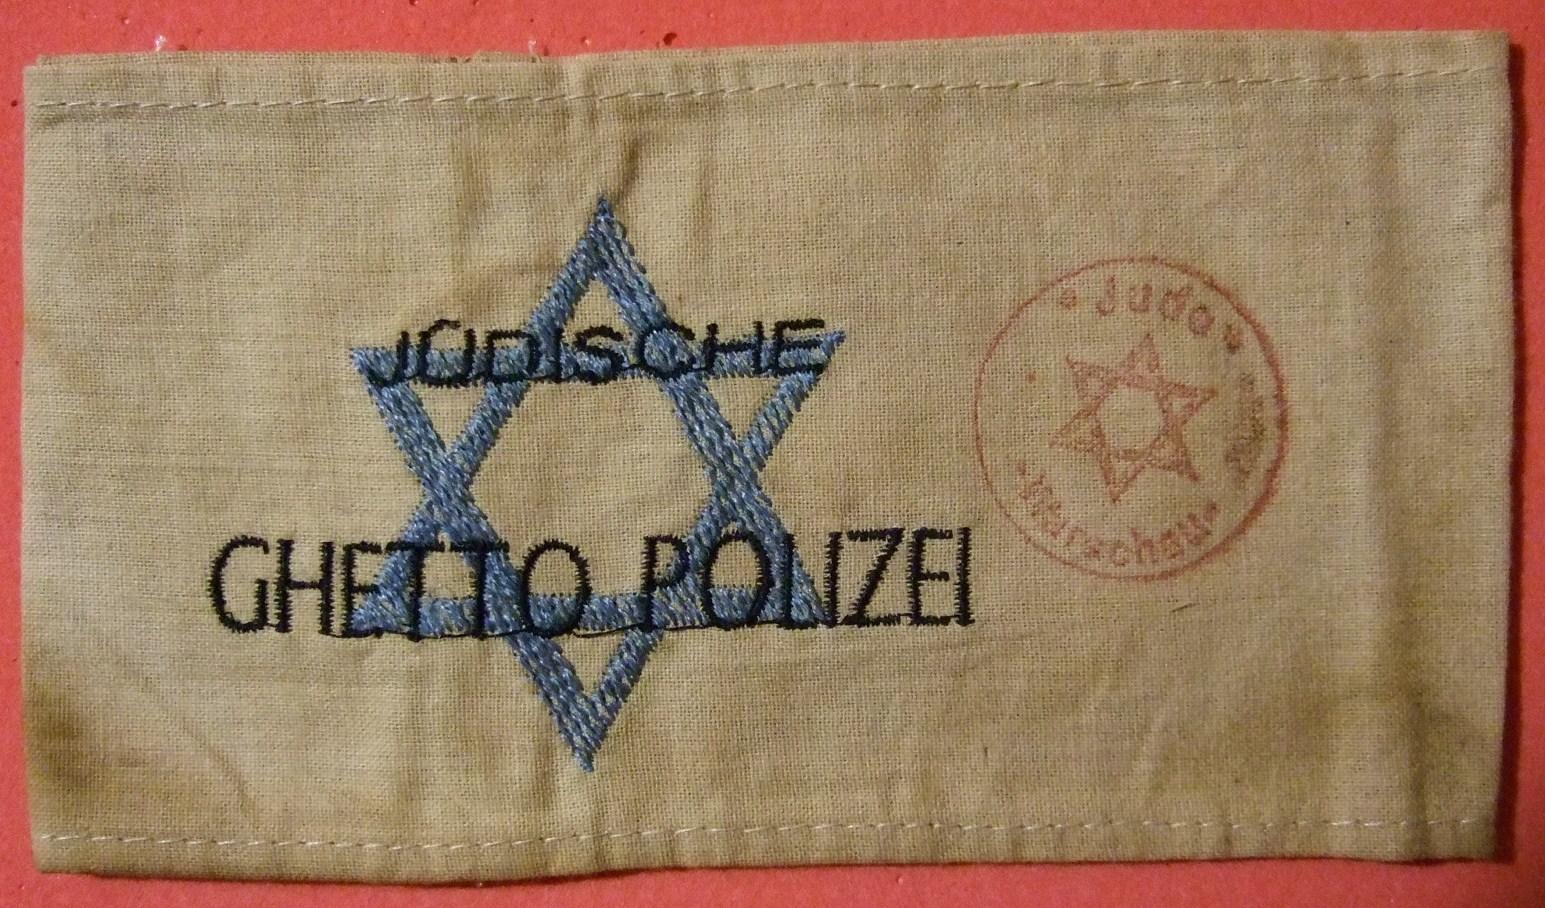 Ghetto Polizei